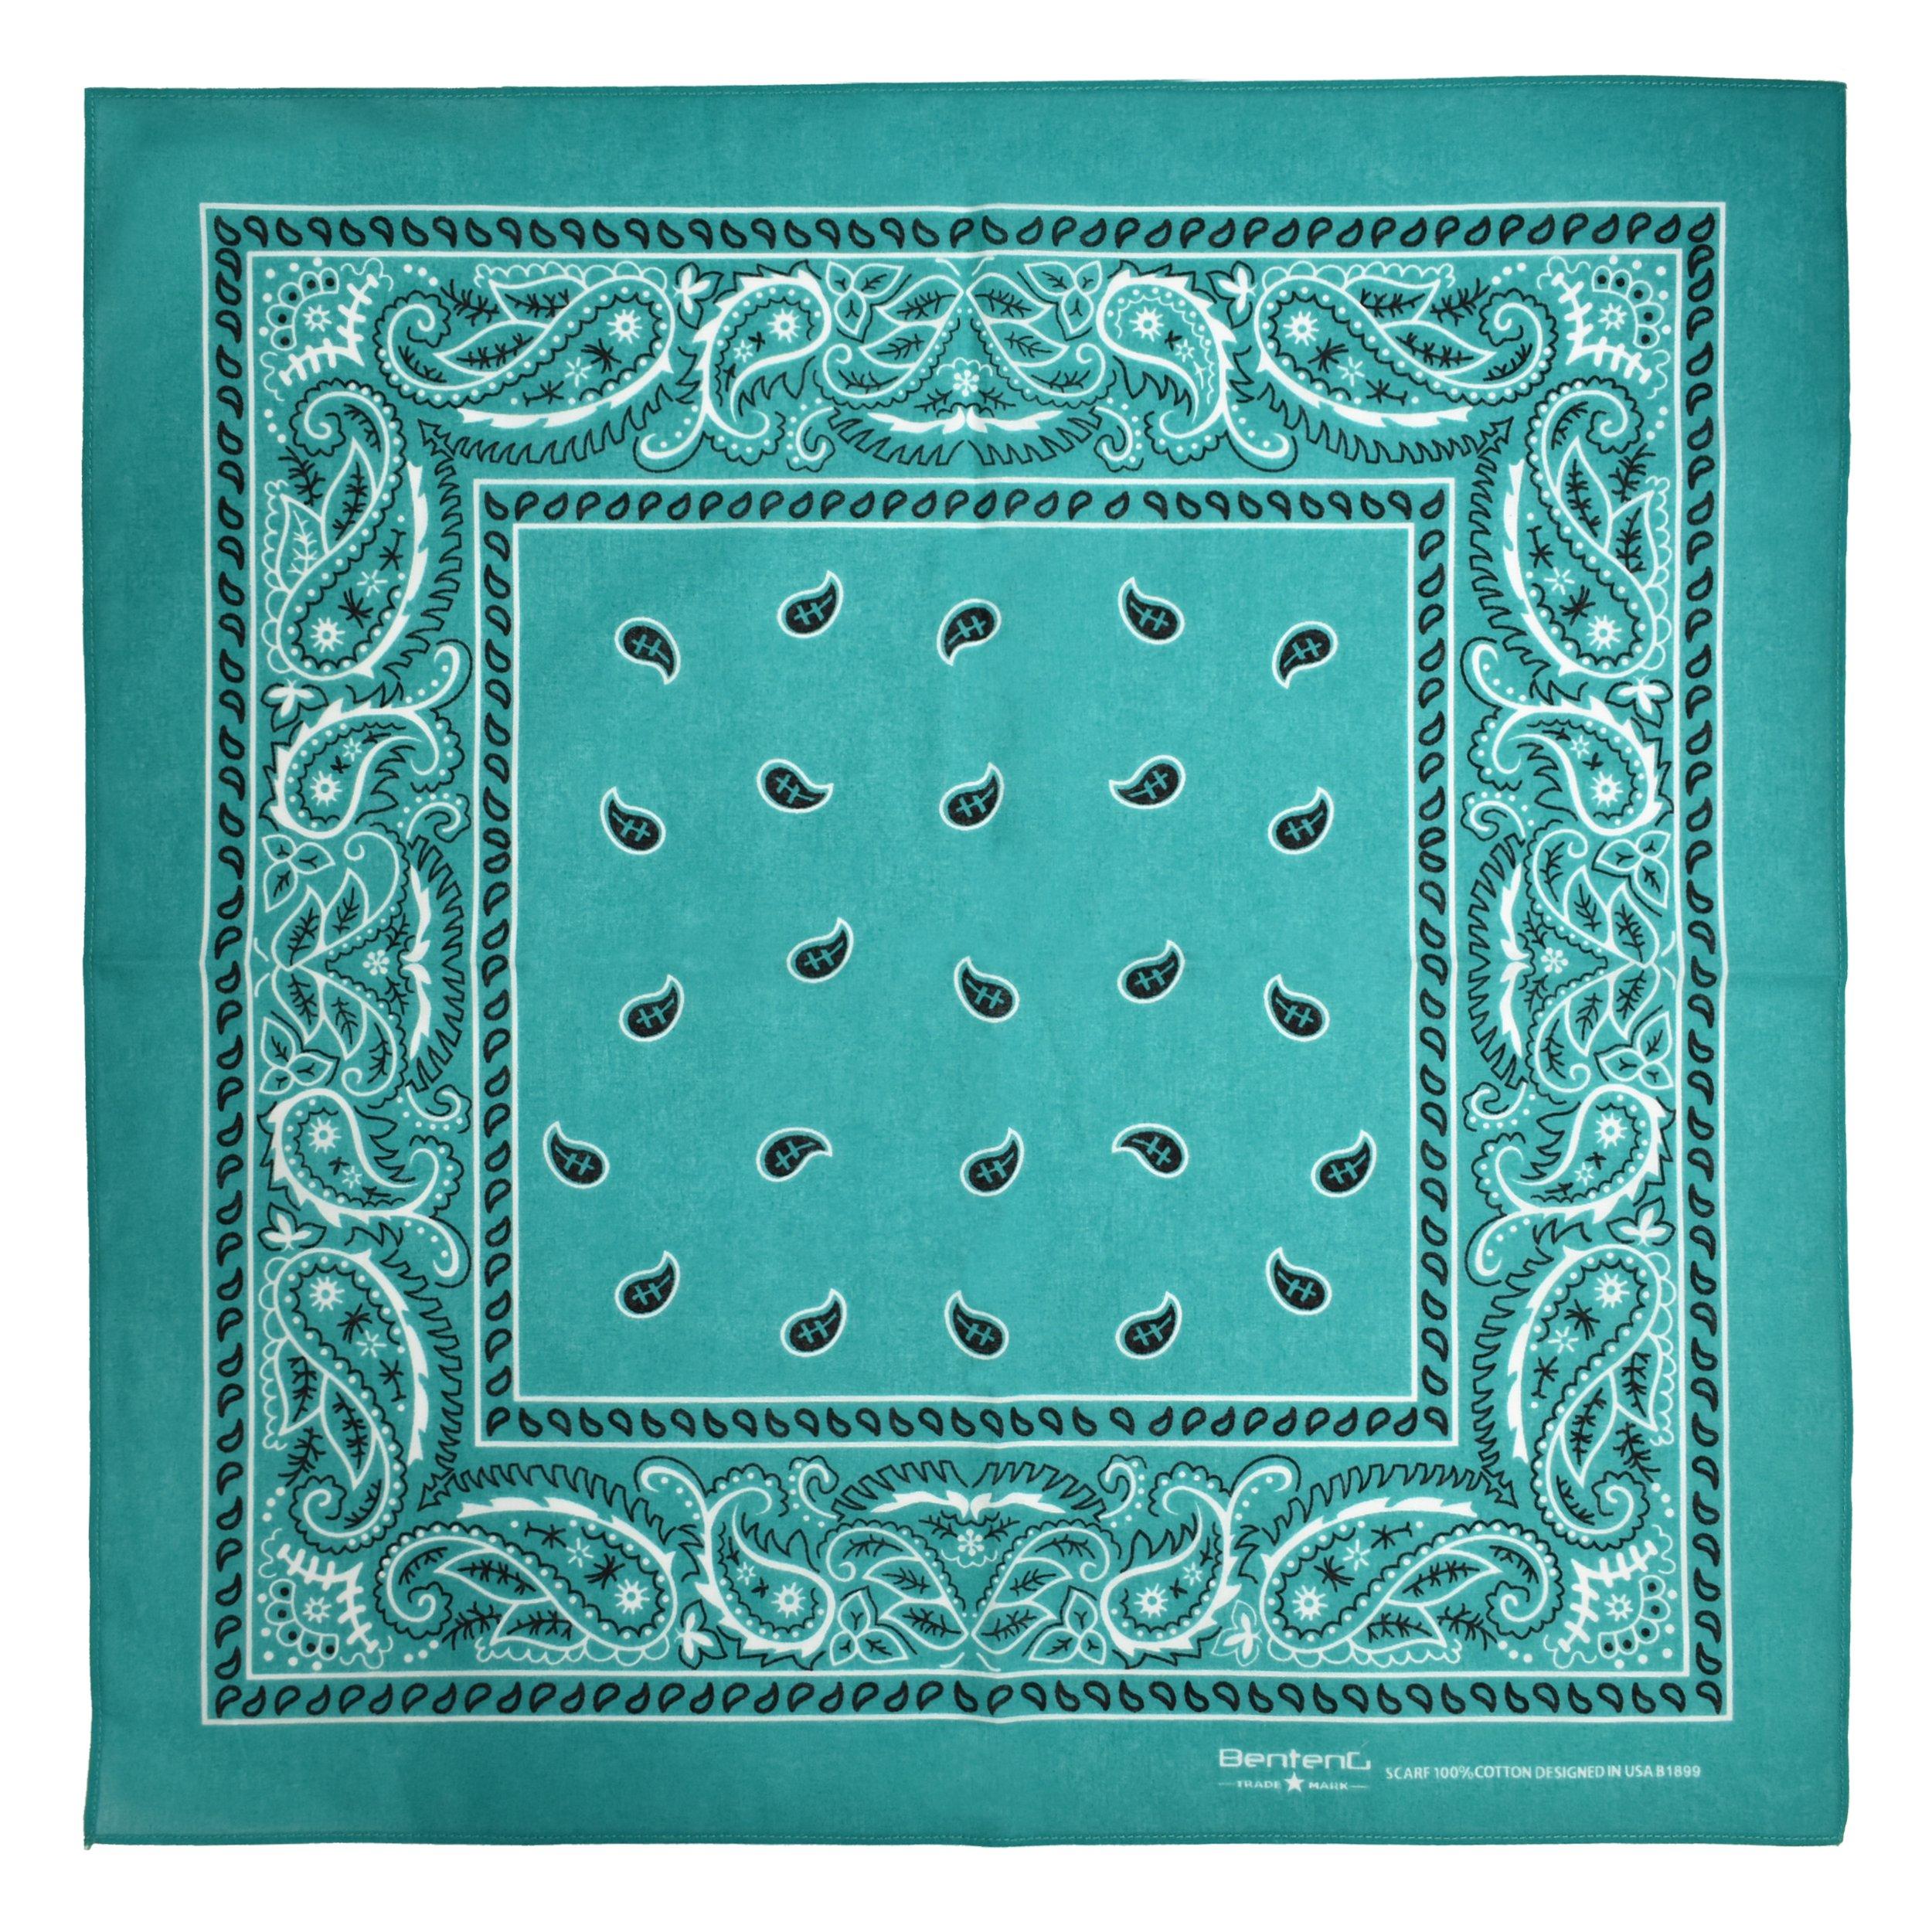 Bandana, 12 Pack 100% Cotton Bandanas for Women Men with Paisley, Flags & More (Cyan)